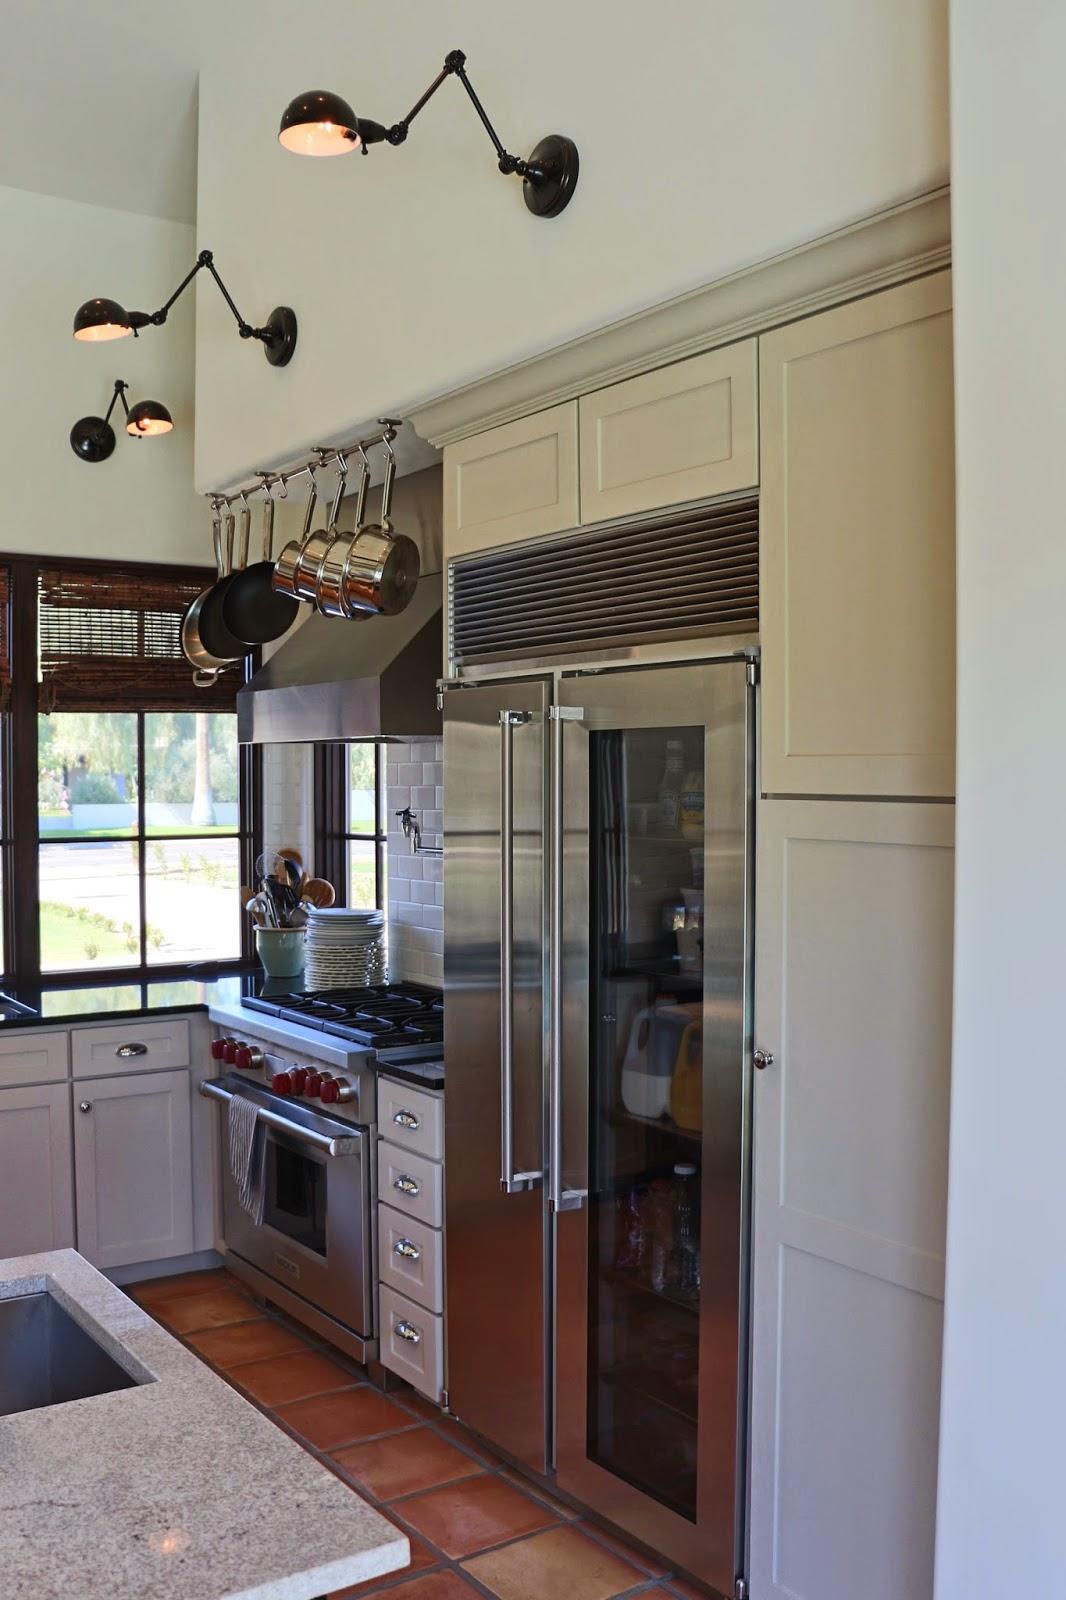 glass door fridge, wolf stove, aga marvel fridge, built in stainless steel fridge, glass door refrigerator